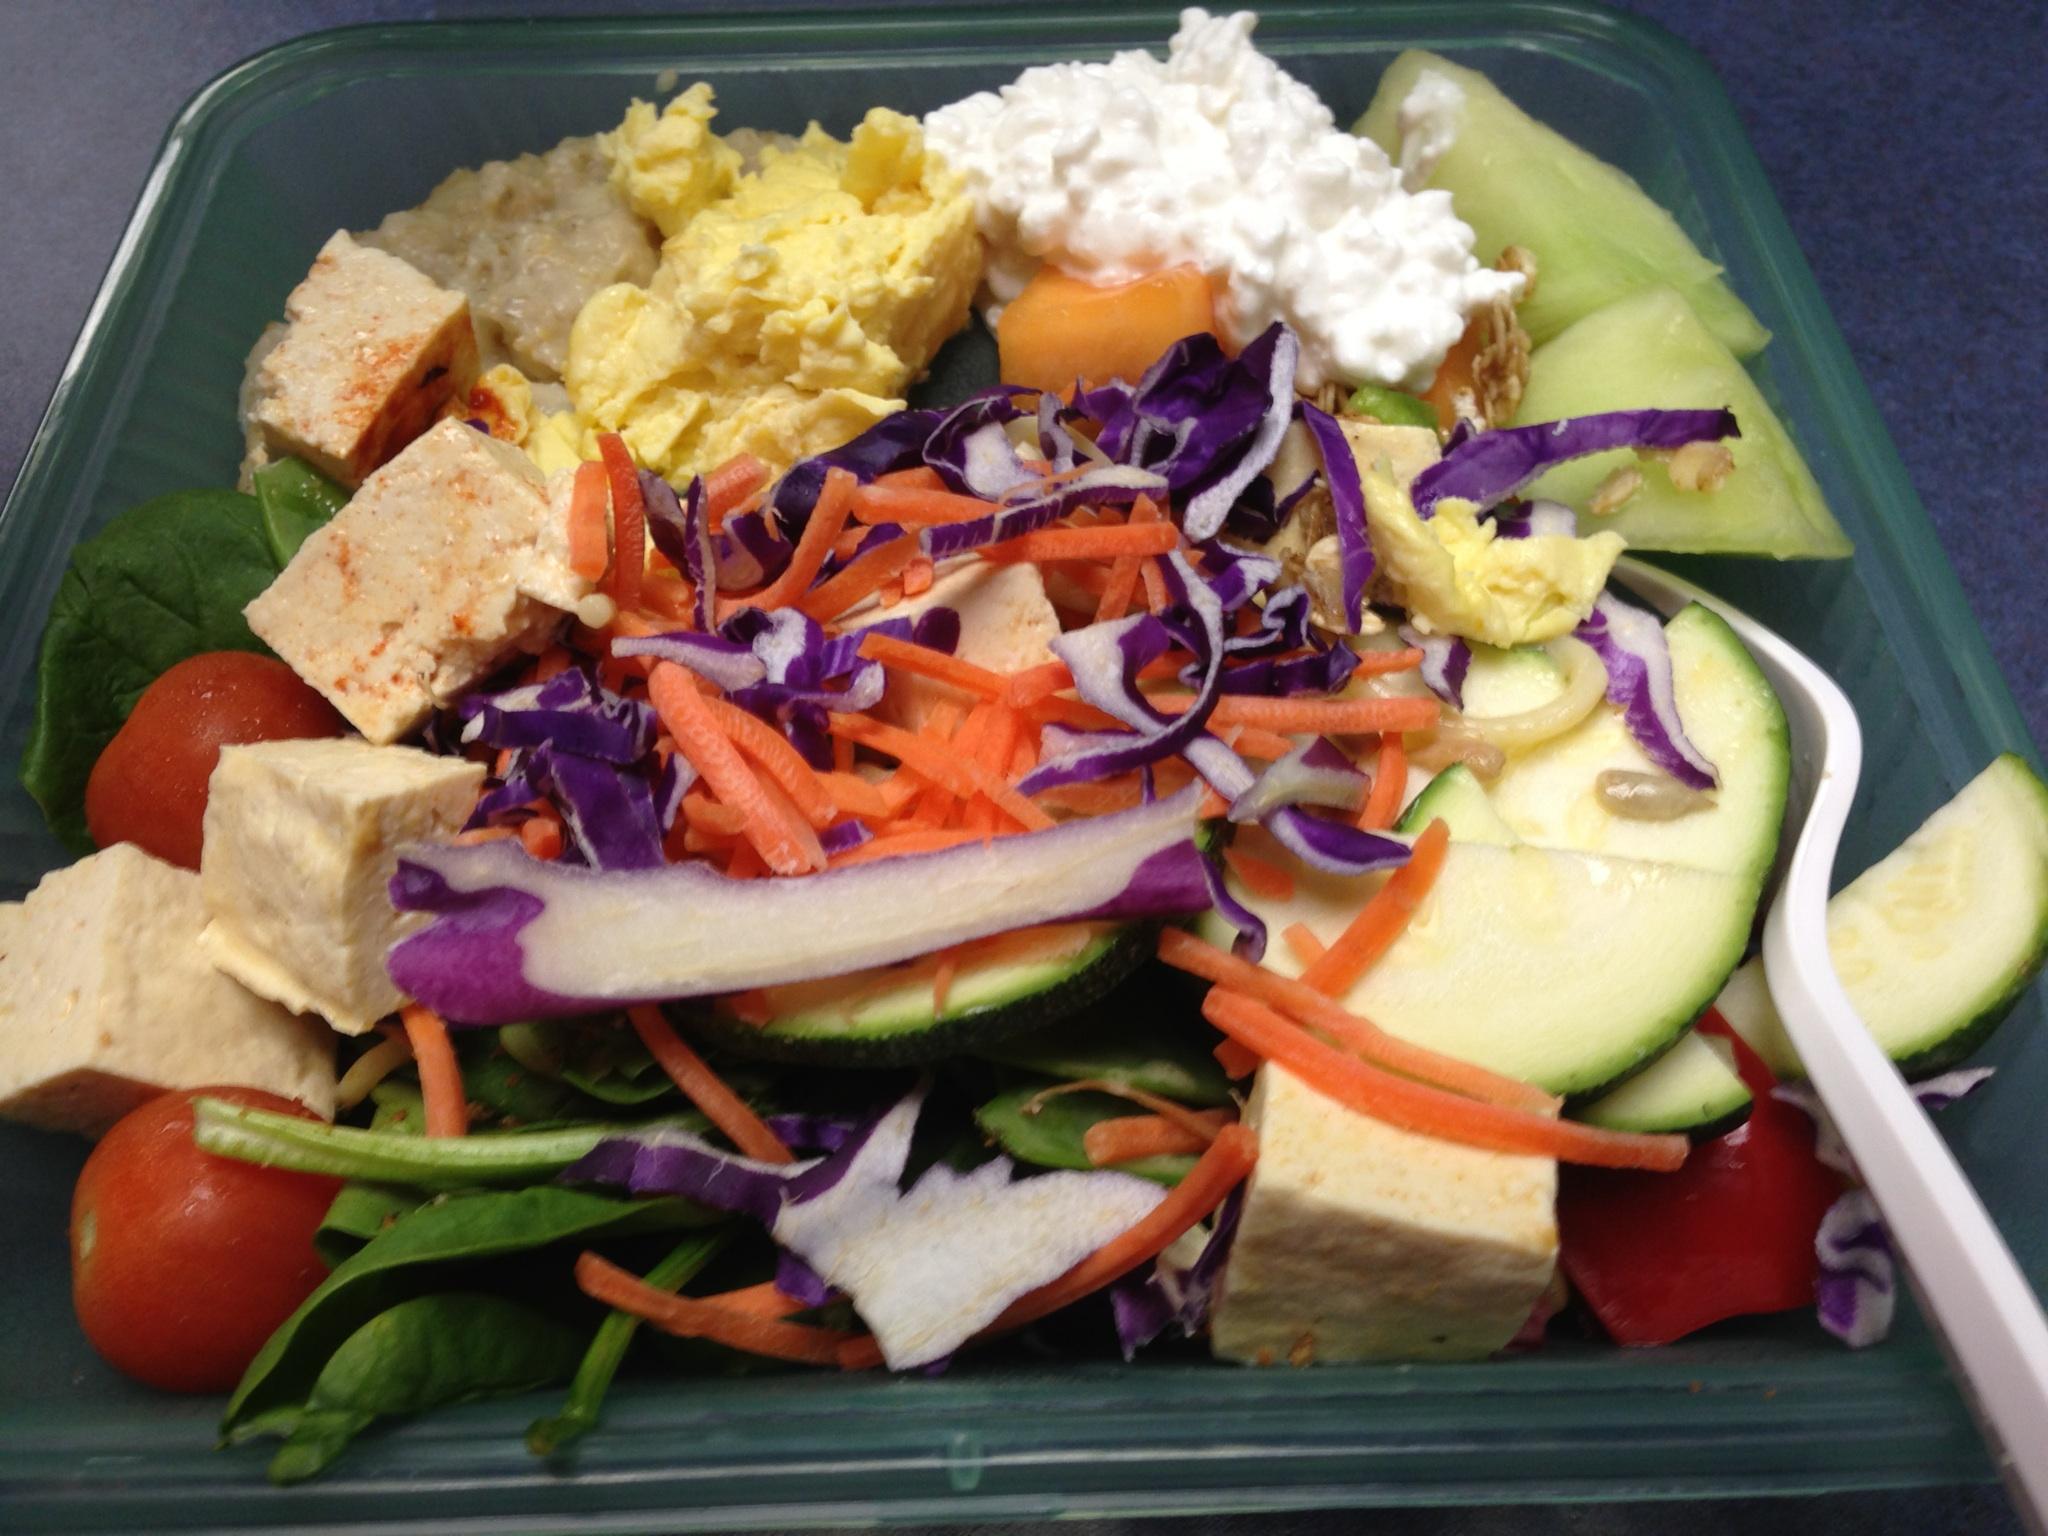 Salad, curry tofu, cottage cheese, scrambled eggs, and oatmeal